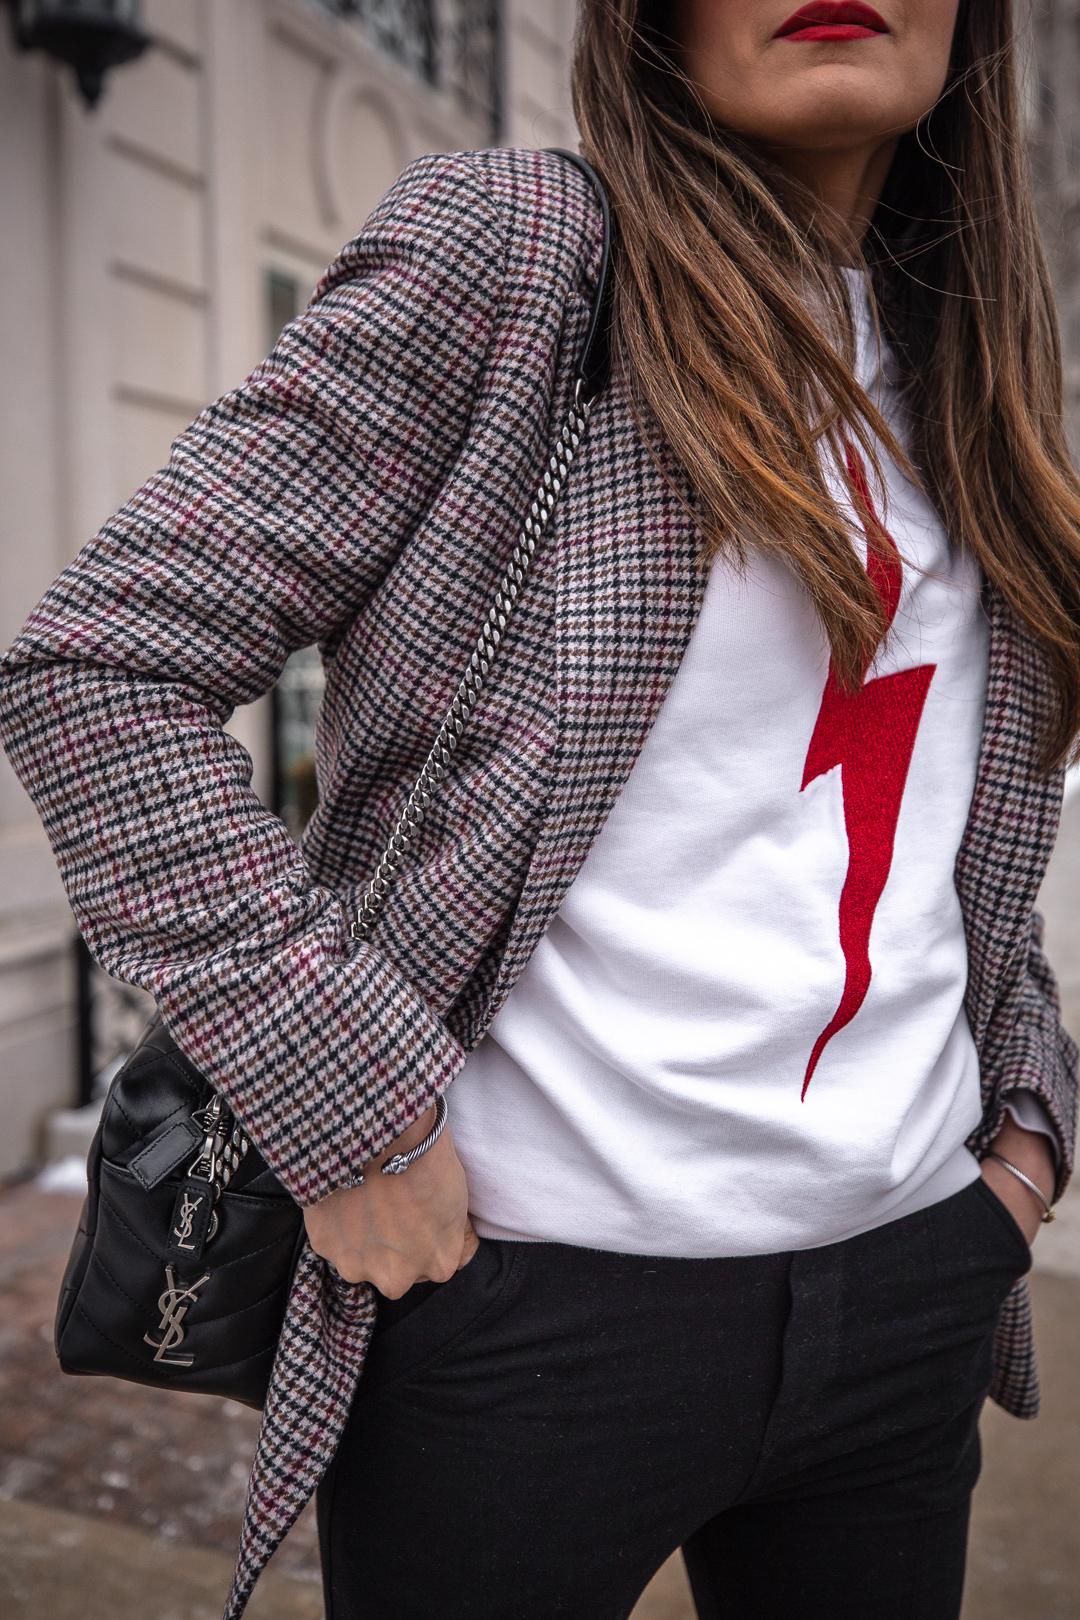 nathalie martin - anine bing lightning bold sweater, alexander wang lyndon boots, bonlook jerry glasses, plaid blazer, frank and eileen joggers, street style, pinterest @woahstyle_7099.jpg